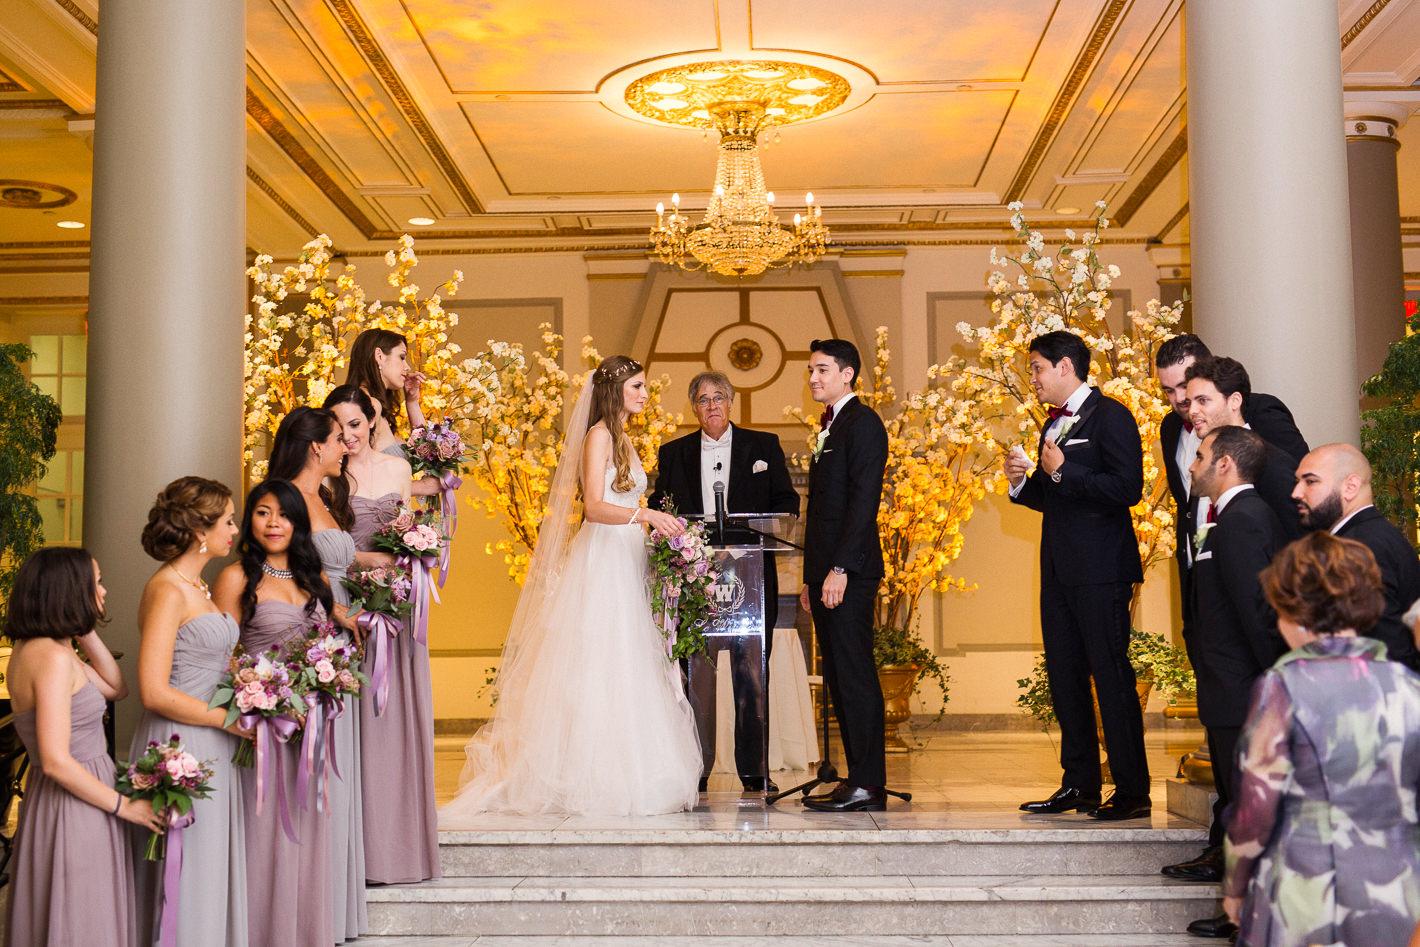 mariage-boheme-chic-au-windsor-8